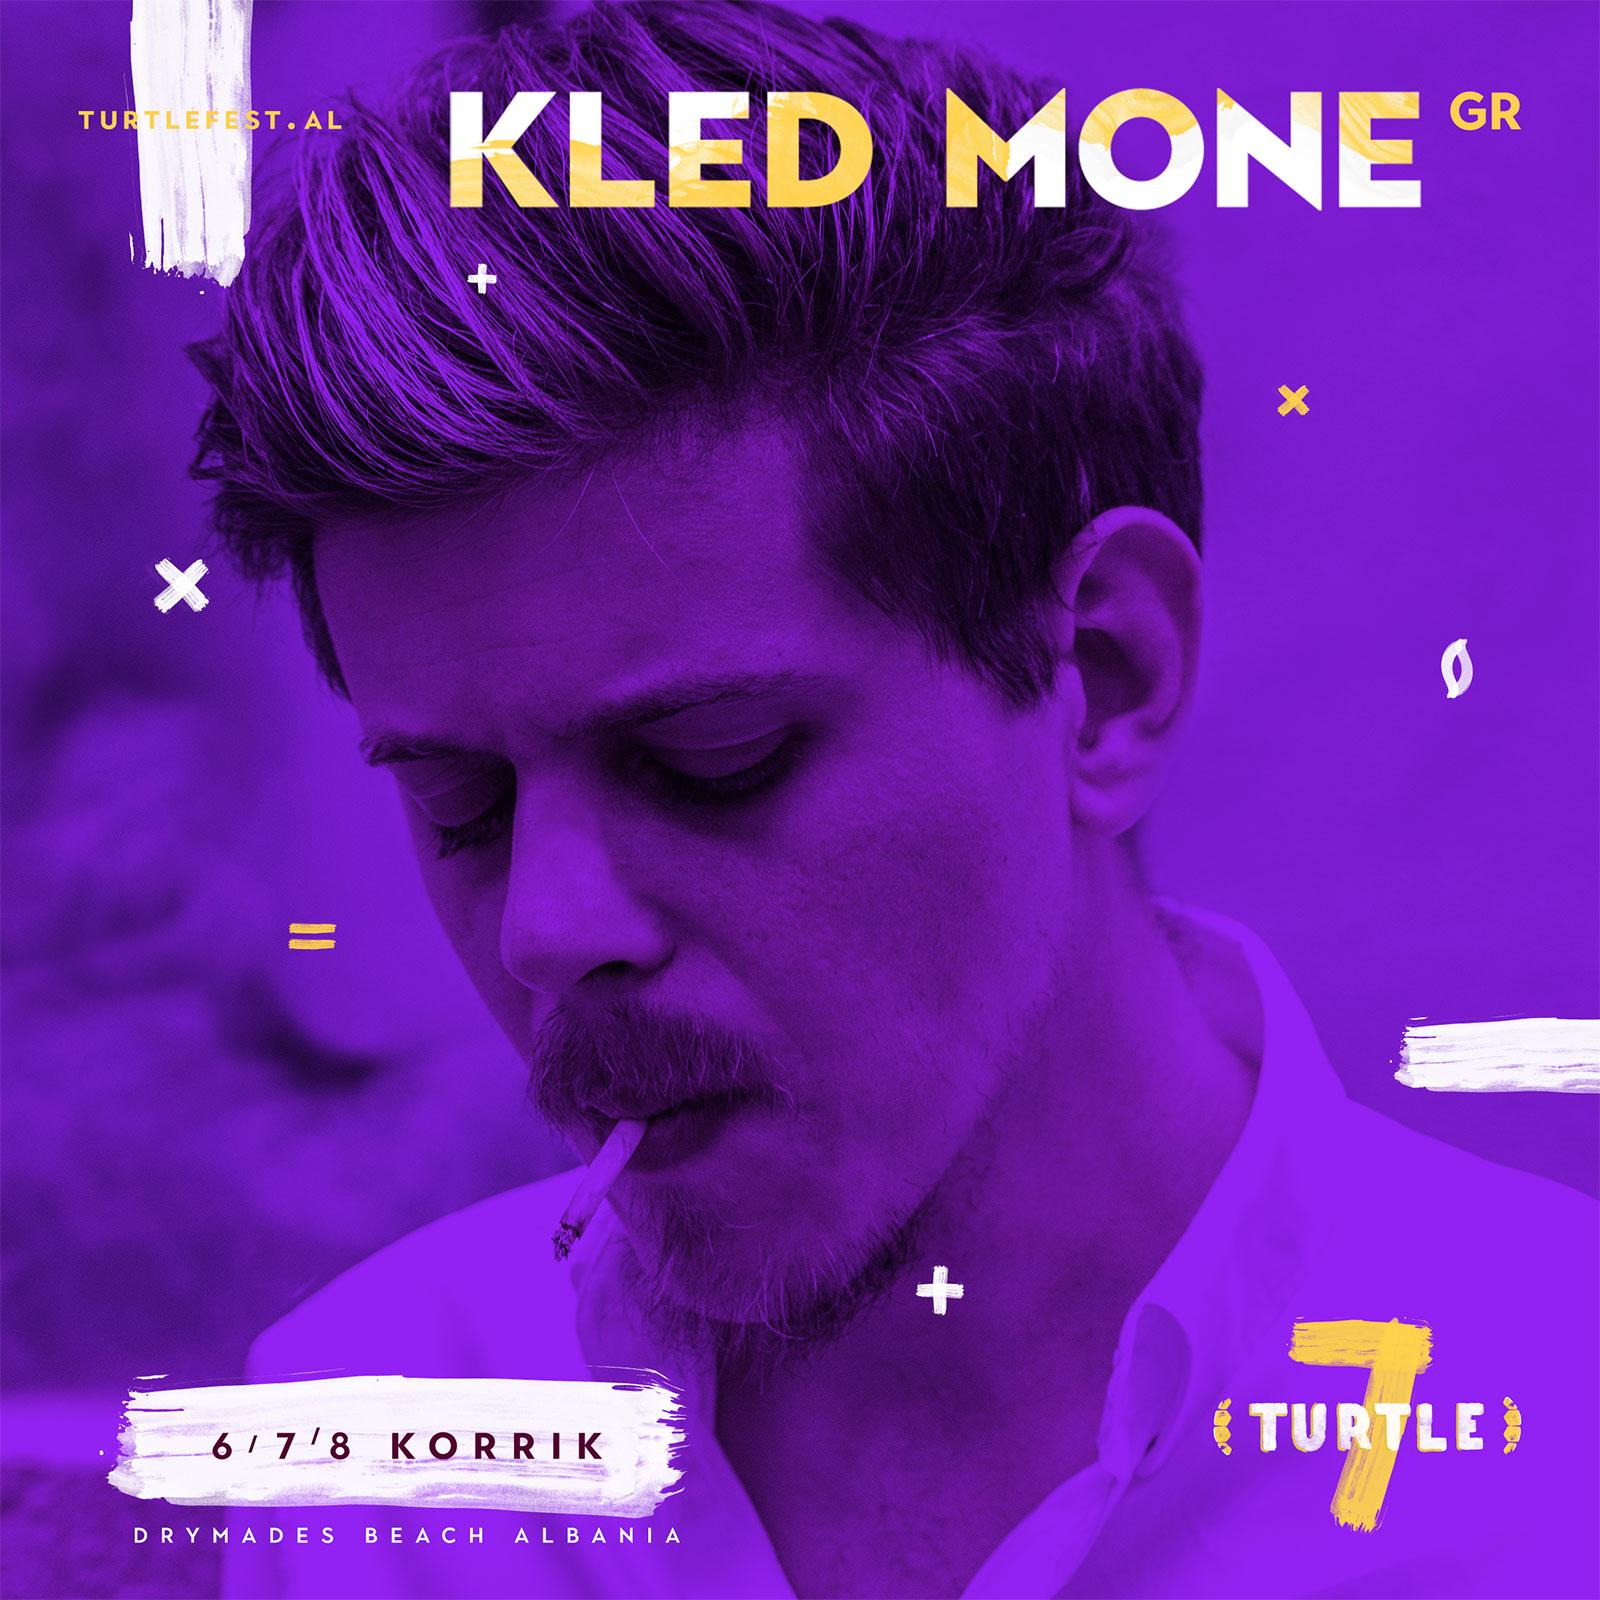 Kled Mone - Turtle Fest